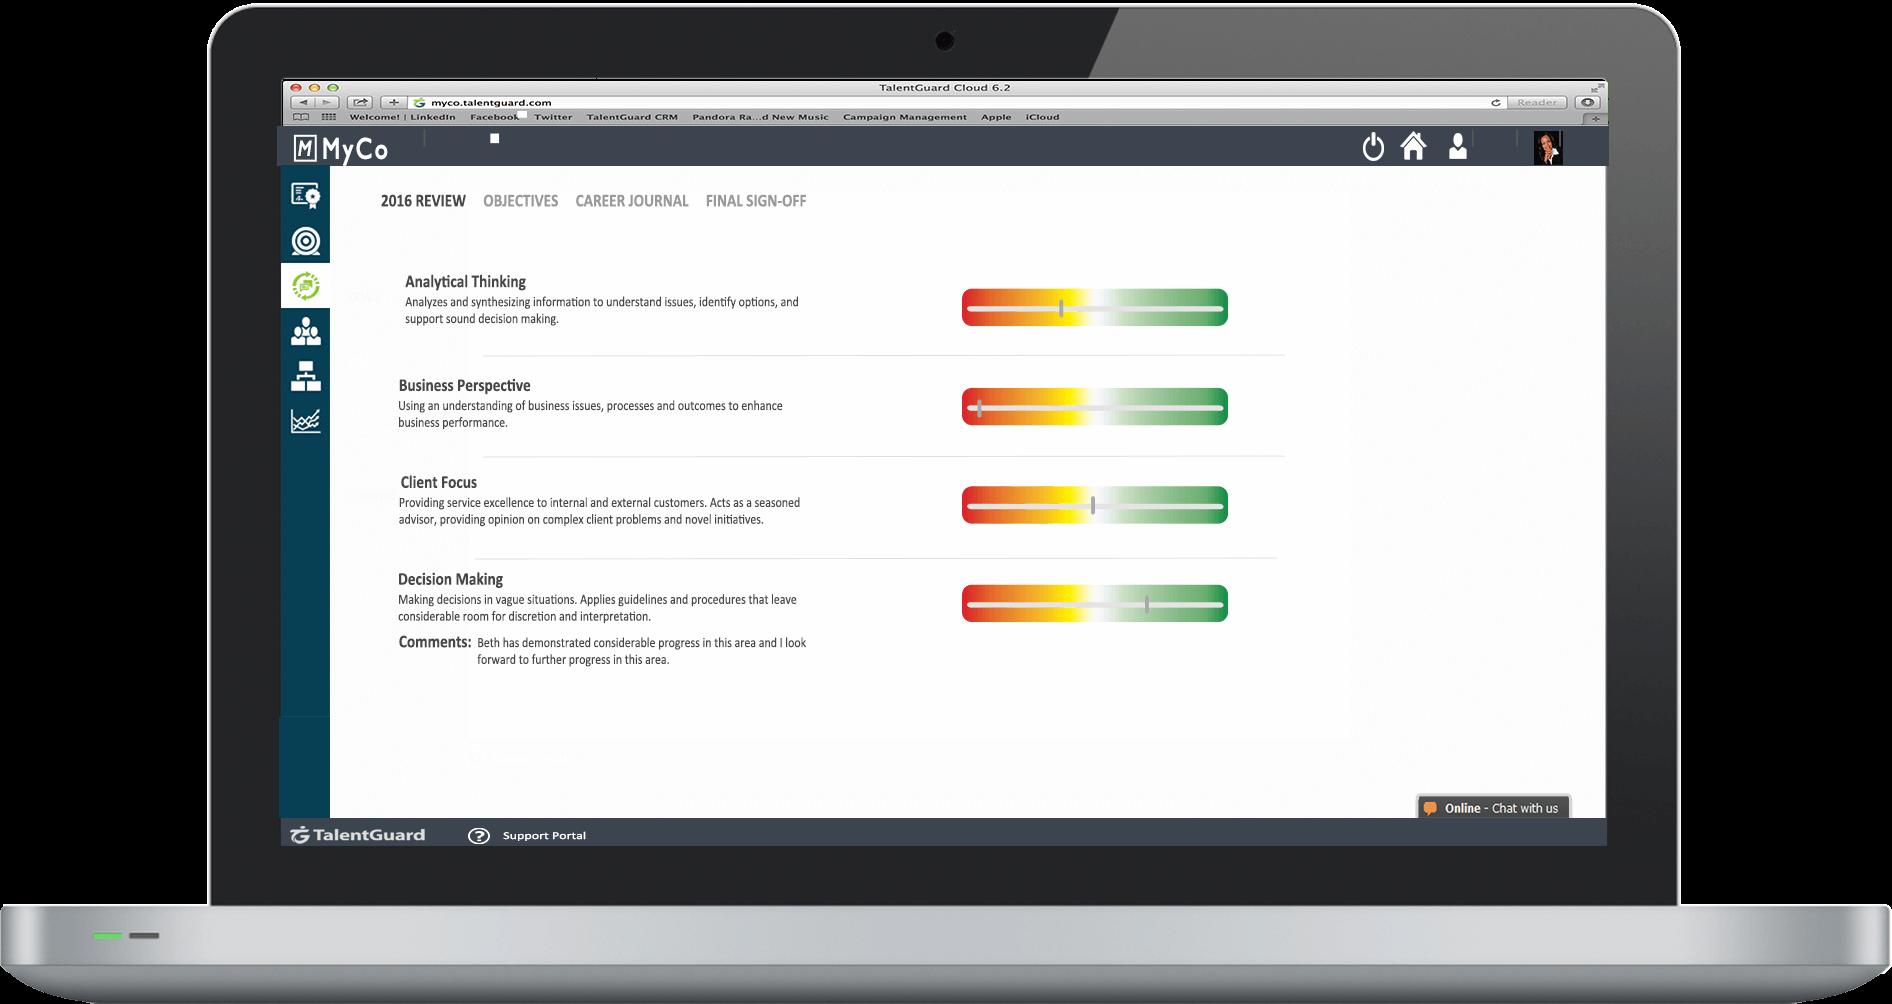 Performance Management Software TalentGuard